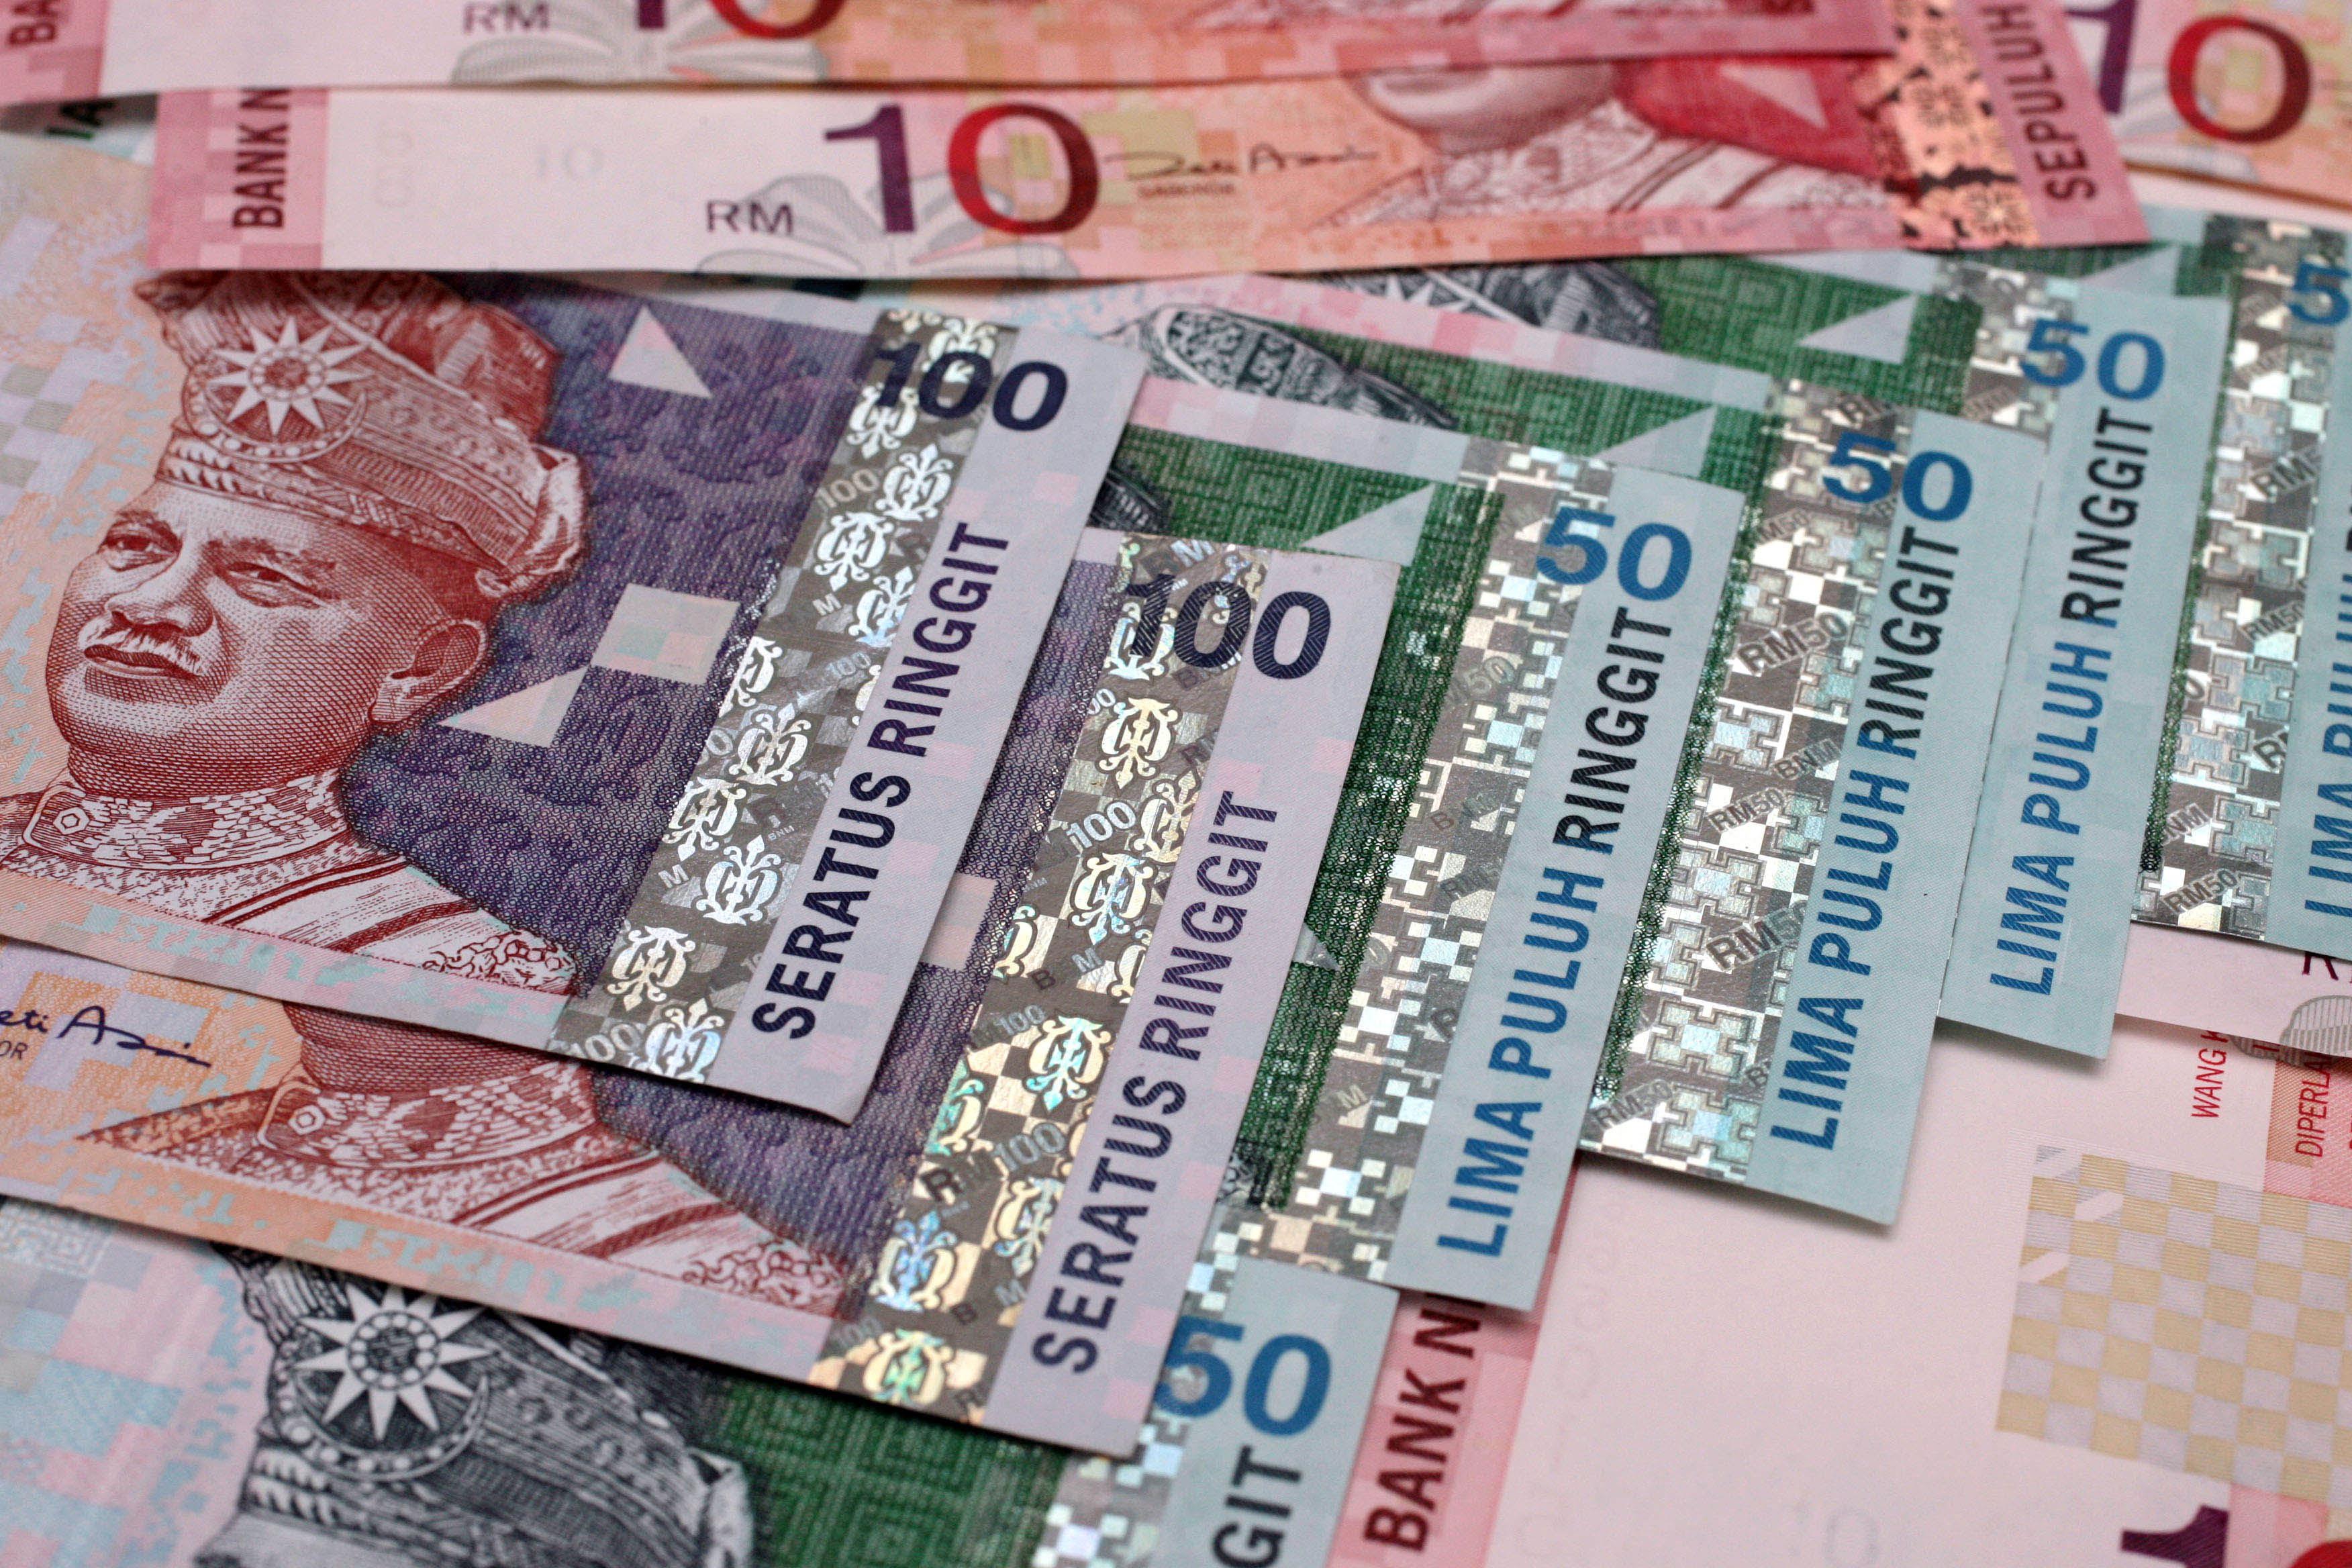 Malaysian currency-RINGGIT.Monday.29th.January 2007.Photographer: Goh Seng Chong/Bloomberg News